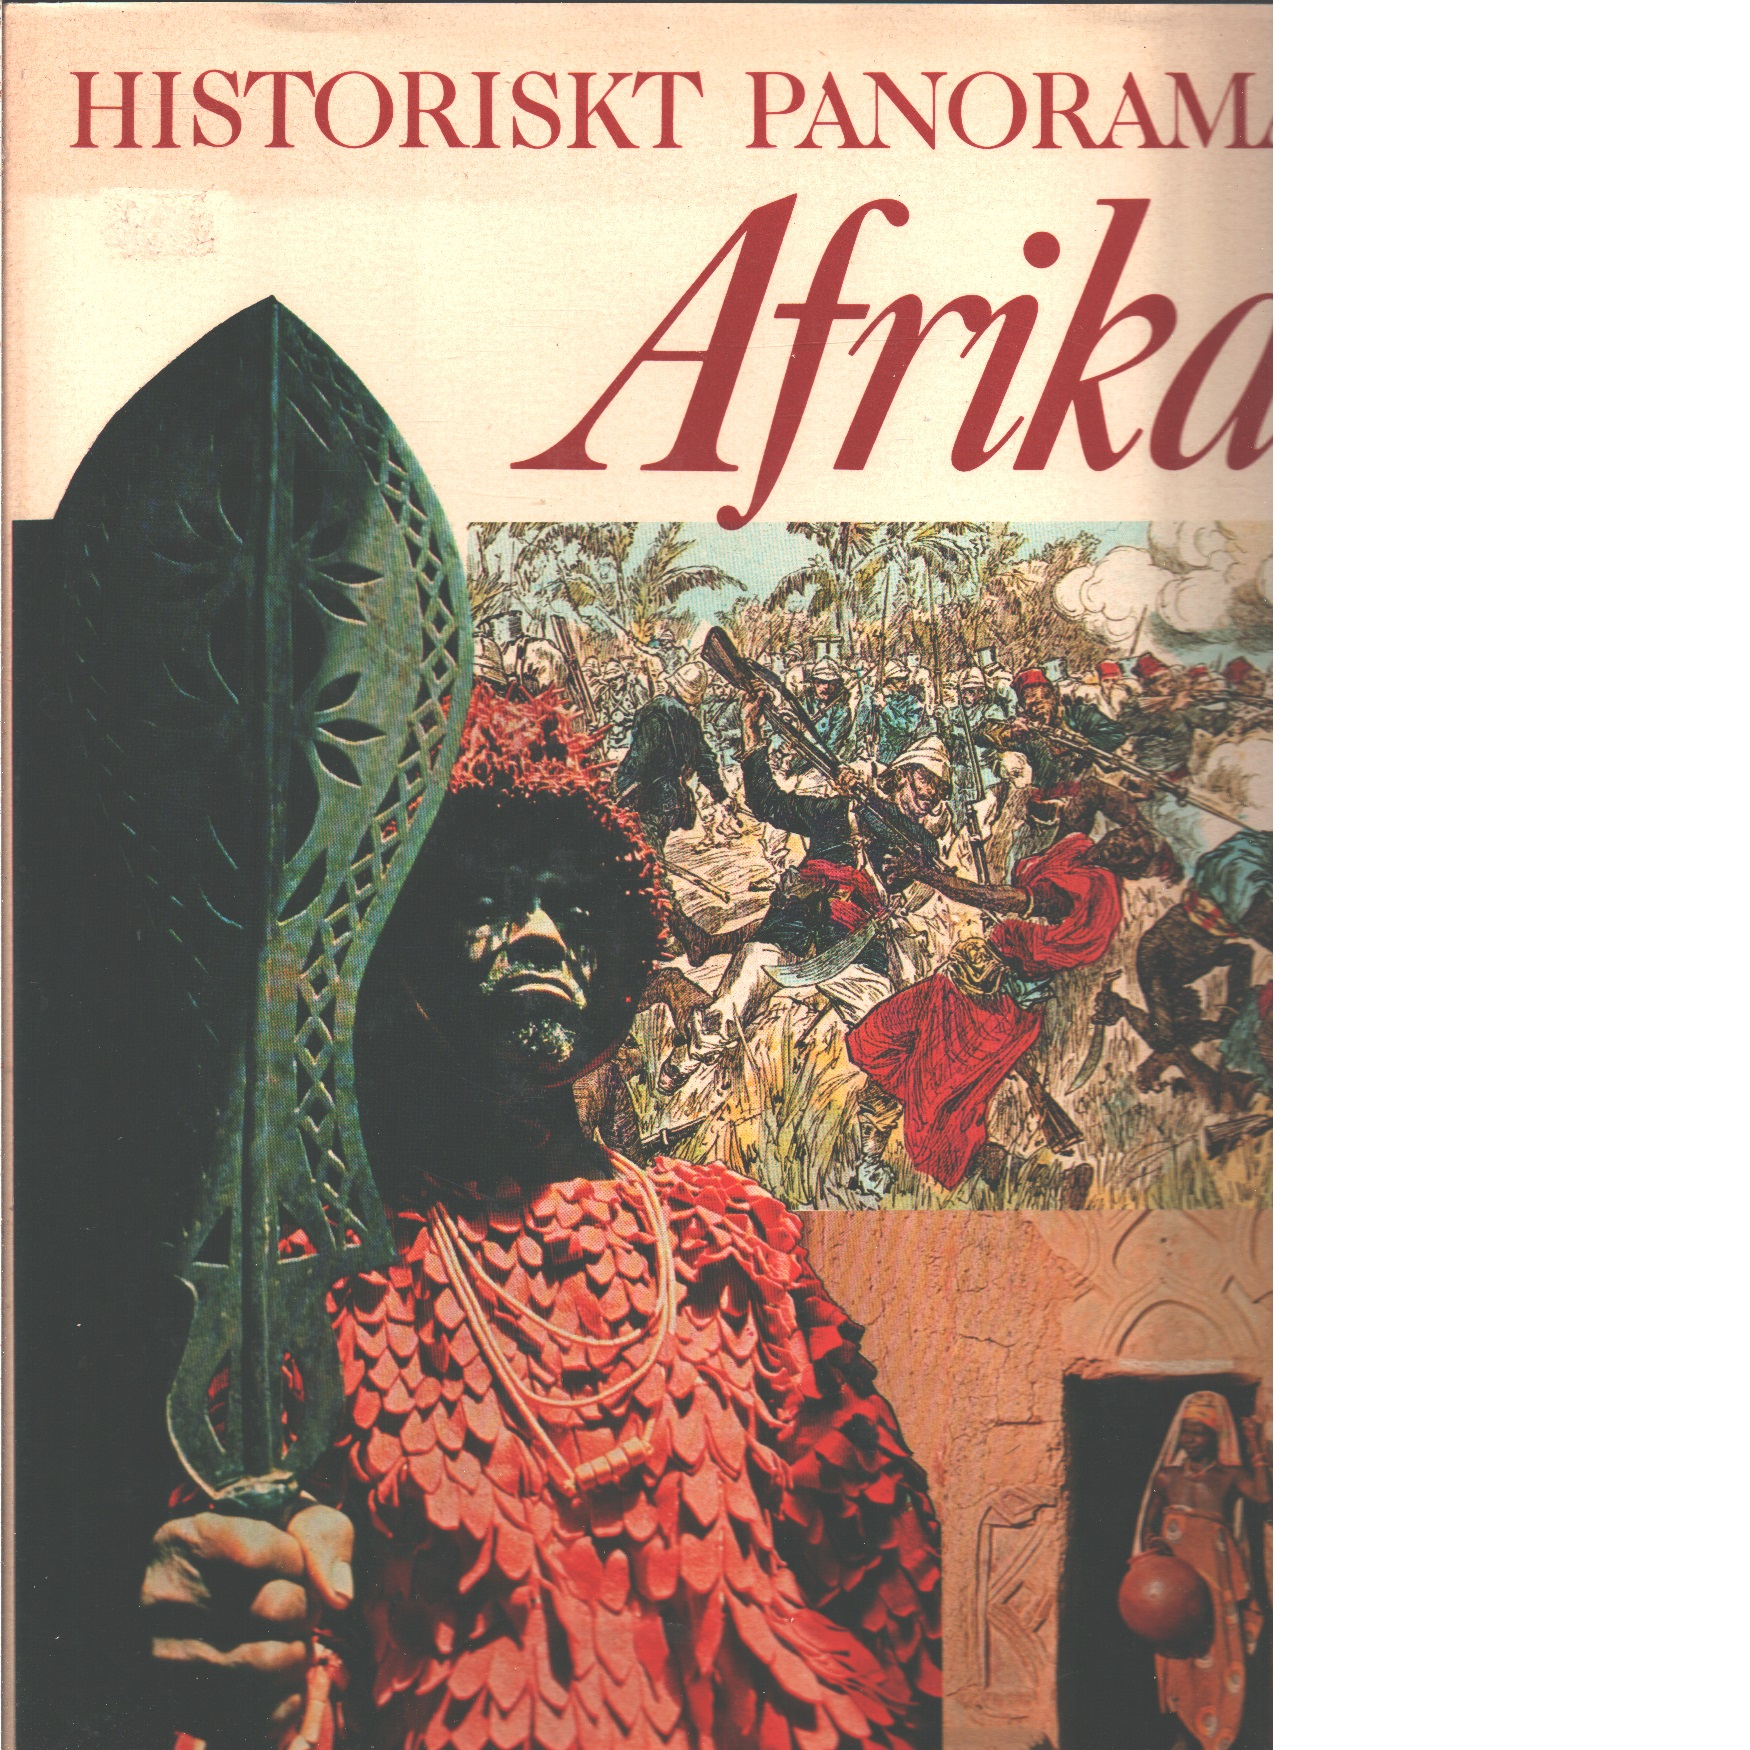 Historiskt panorama Afrika  - Red.